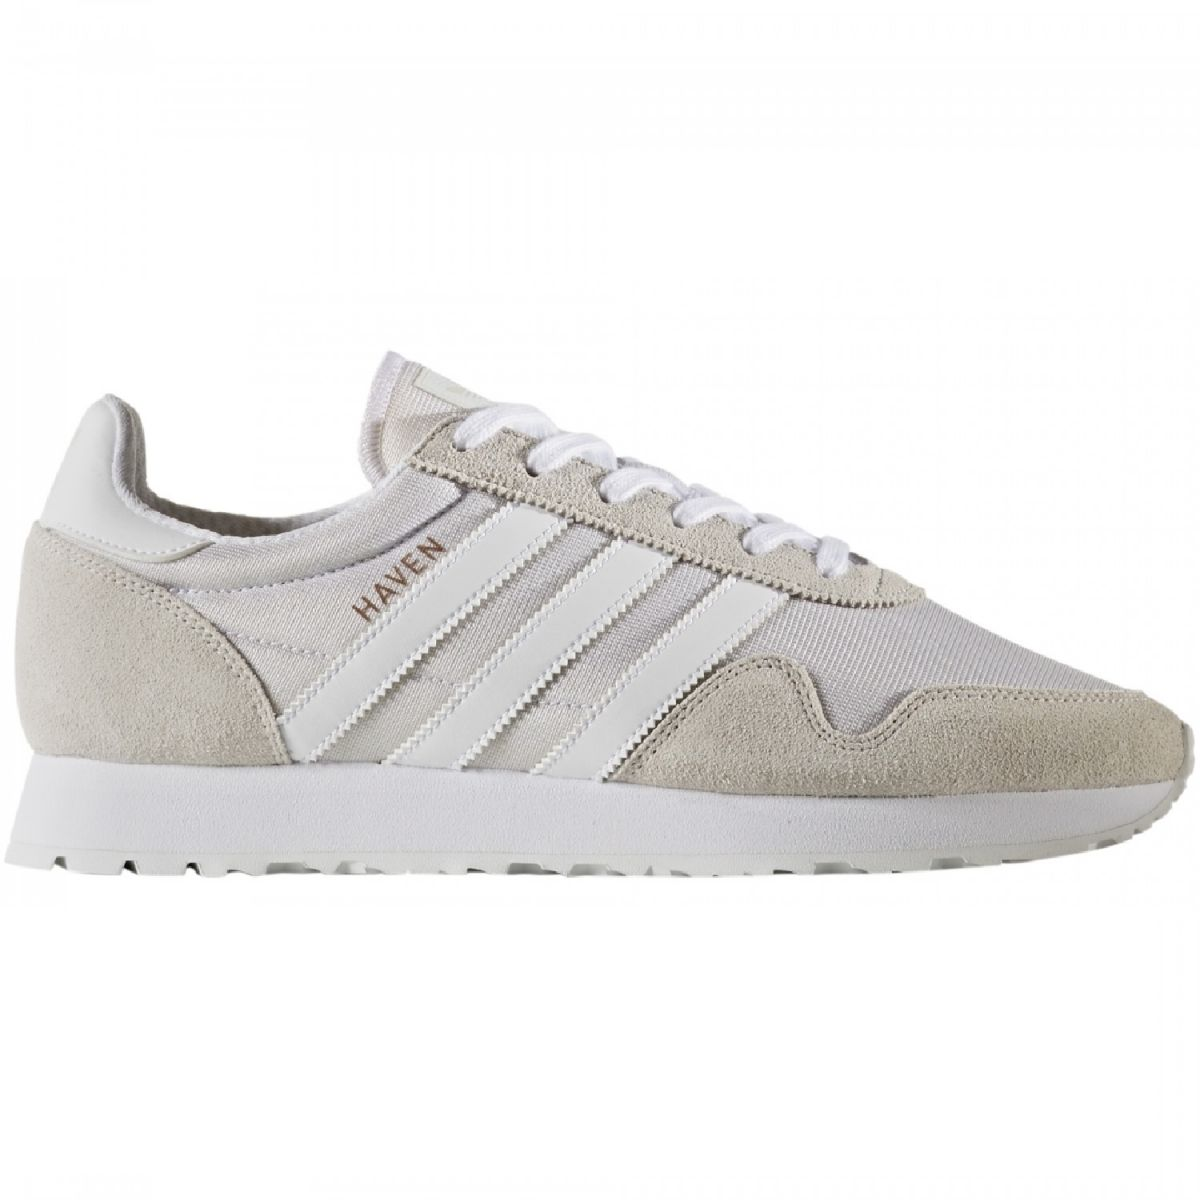 Schuhe Adidas Schuhe Schuhe Beige Schuhe Beige Adidas Adidas Beige Beige Adidas wNO8PXn0k